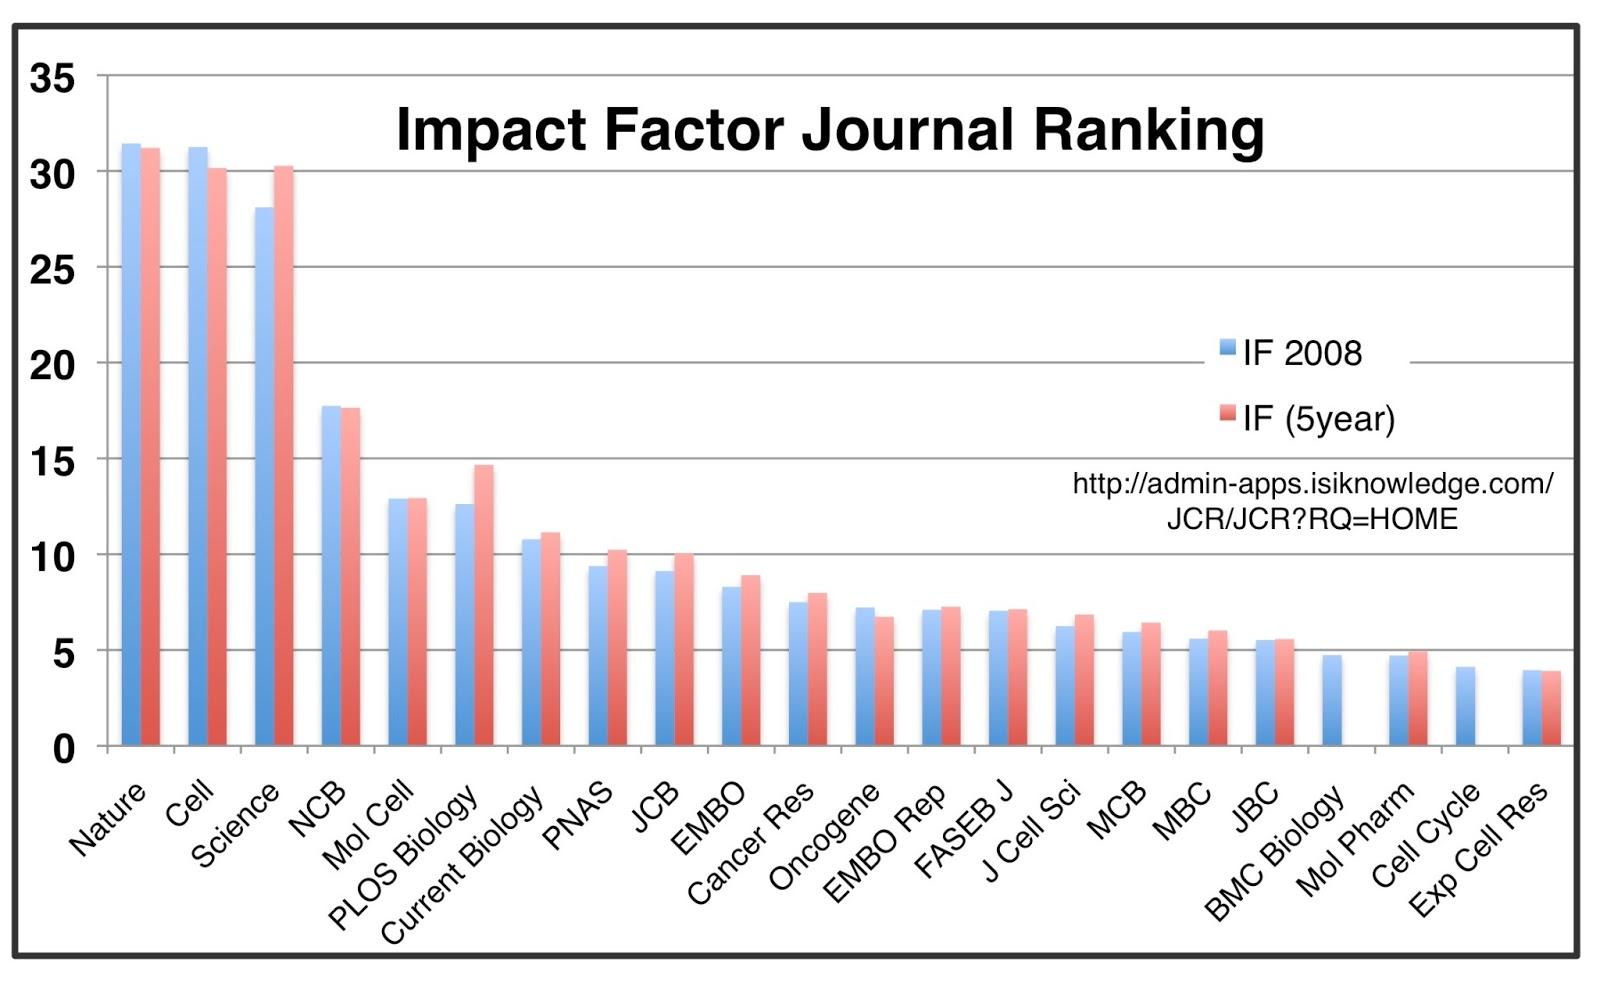 JAN interactive: The impact factor season.